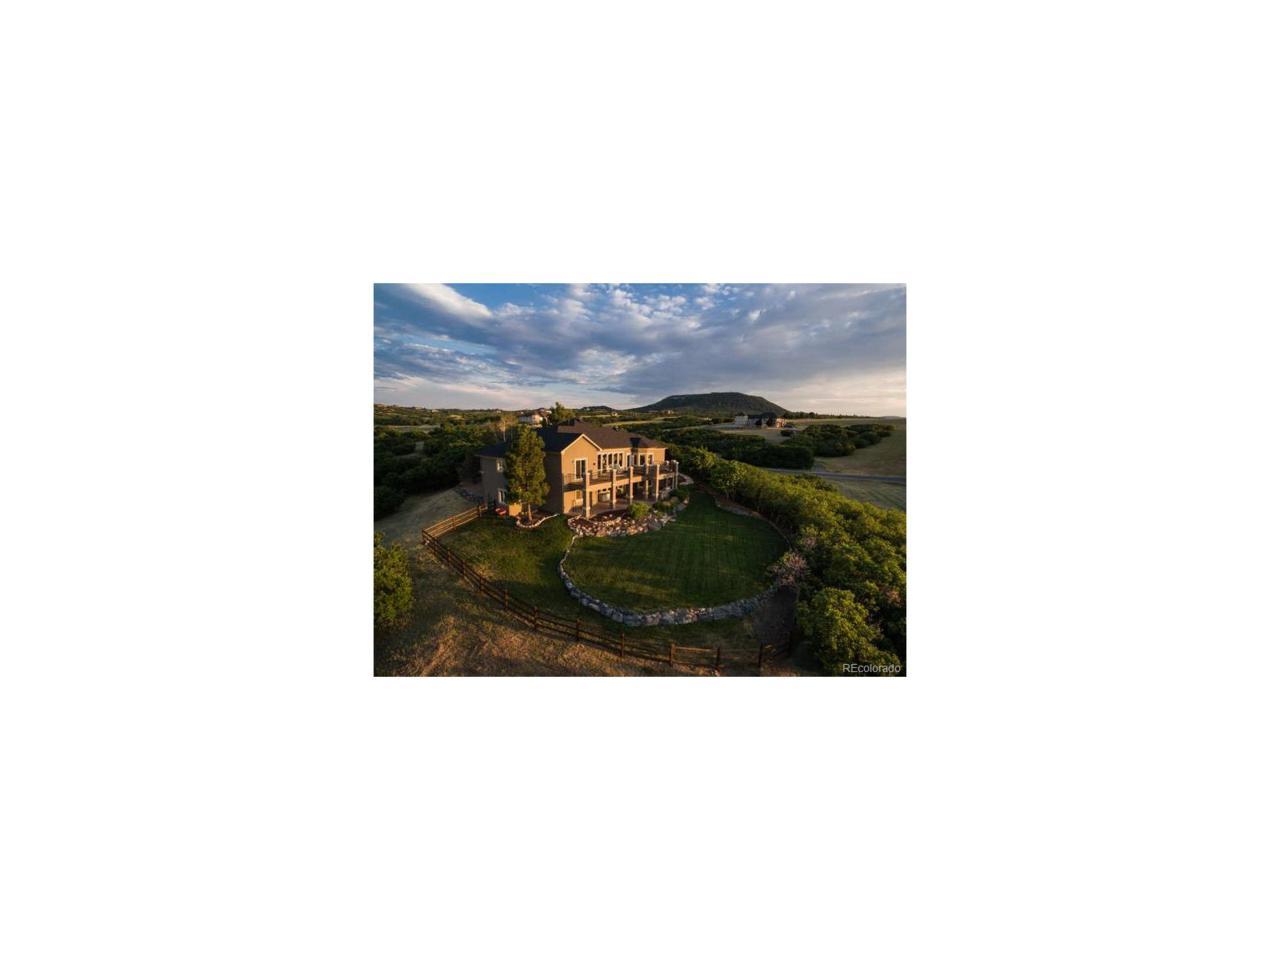 2195 Marlin Way, Castle Rock, CO 80109 (MLS #4226373) :: 8z Real Estate